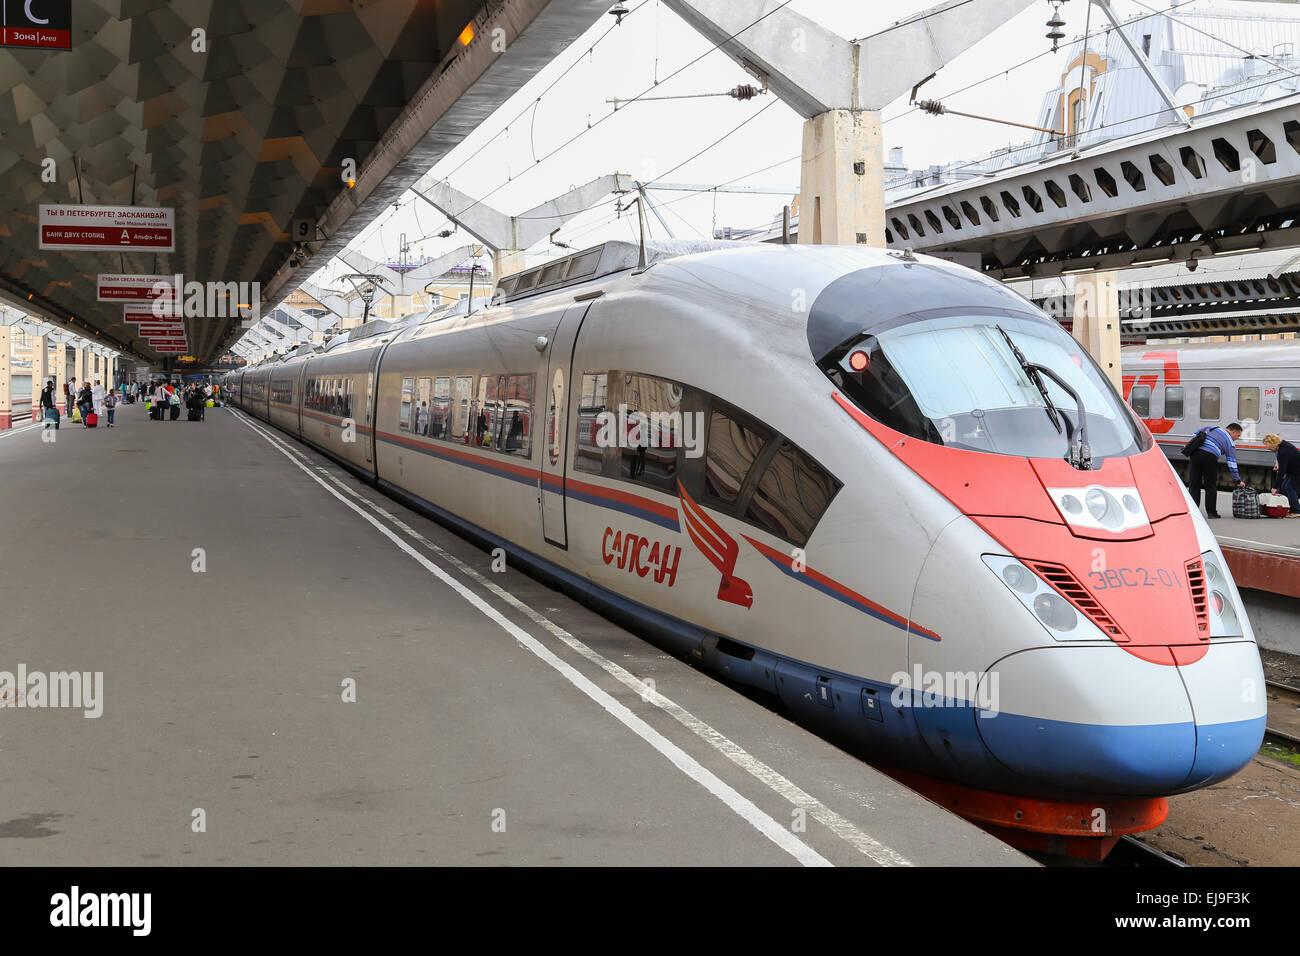 Express Train Sapsan in Saint Petersburg - Stock Image